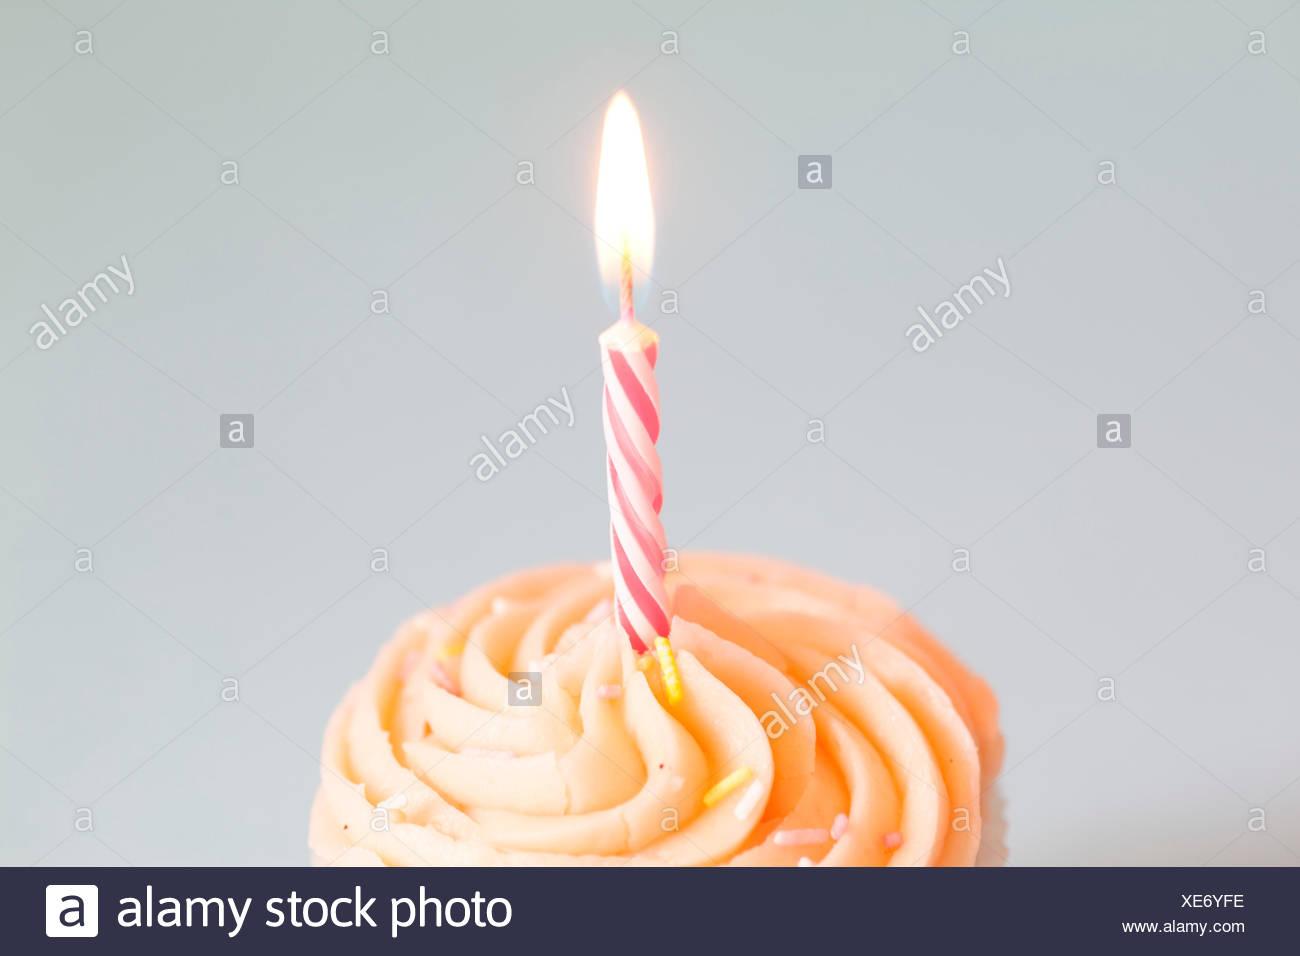 Cupcake On White Background - Stock Image